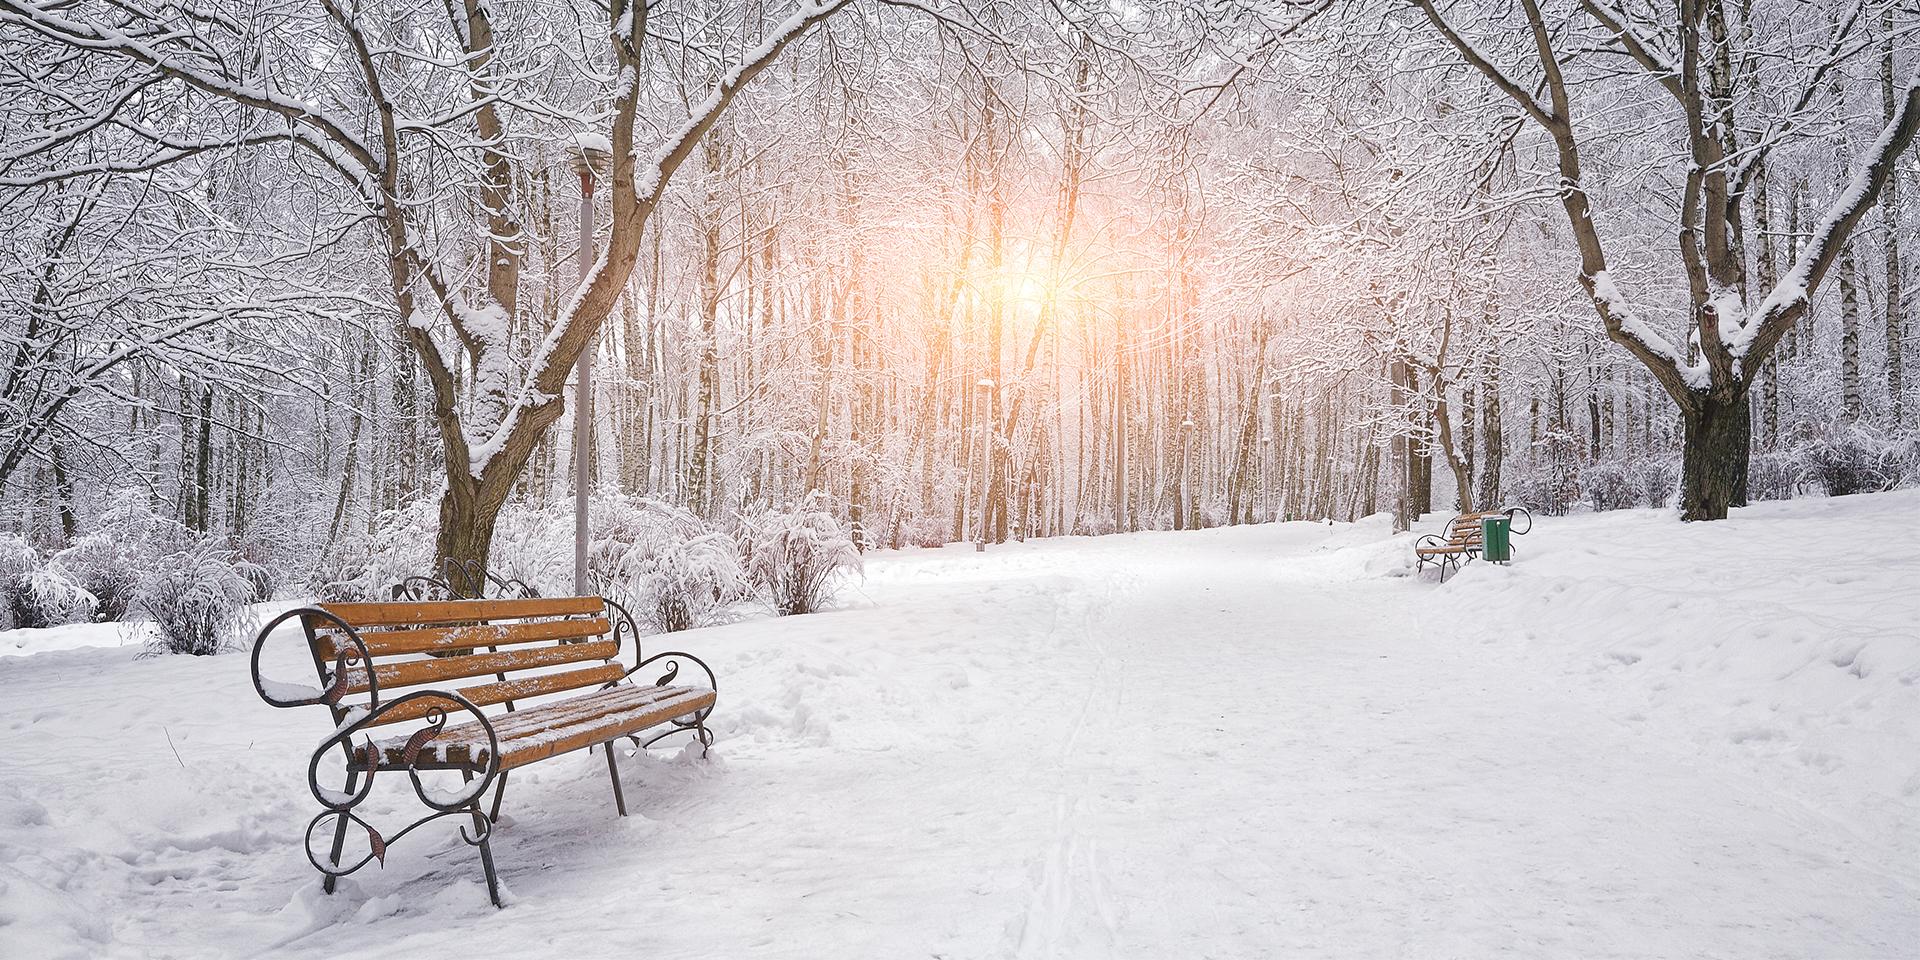 Cool Winter Puns